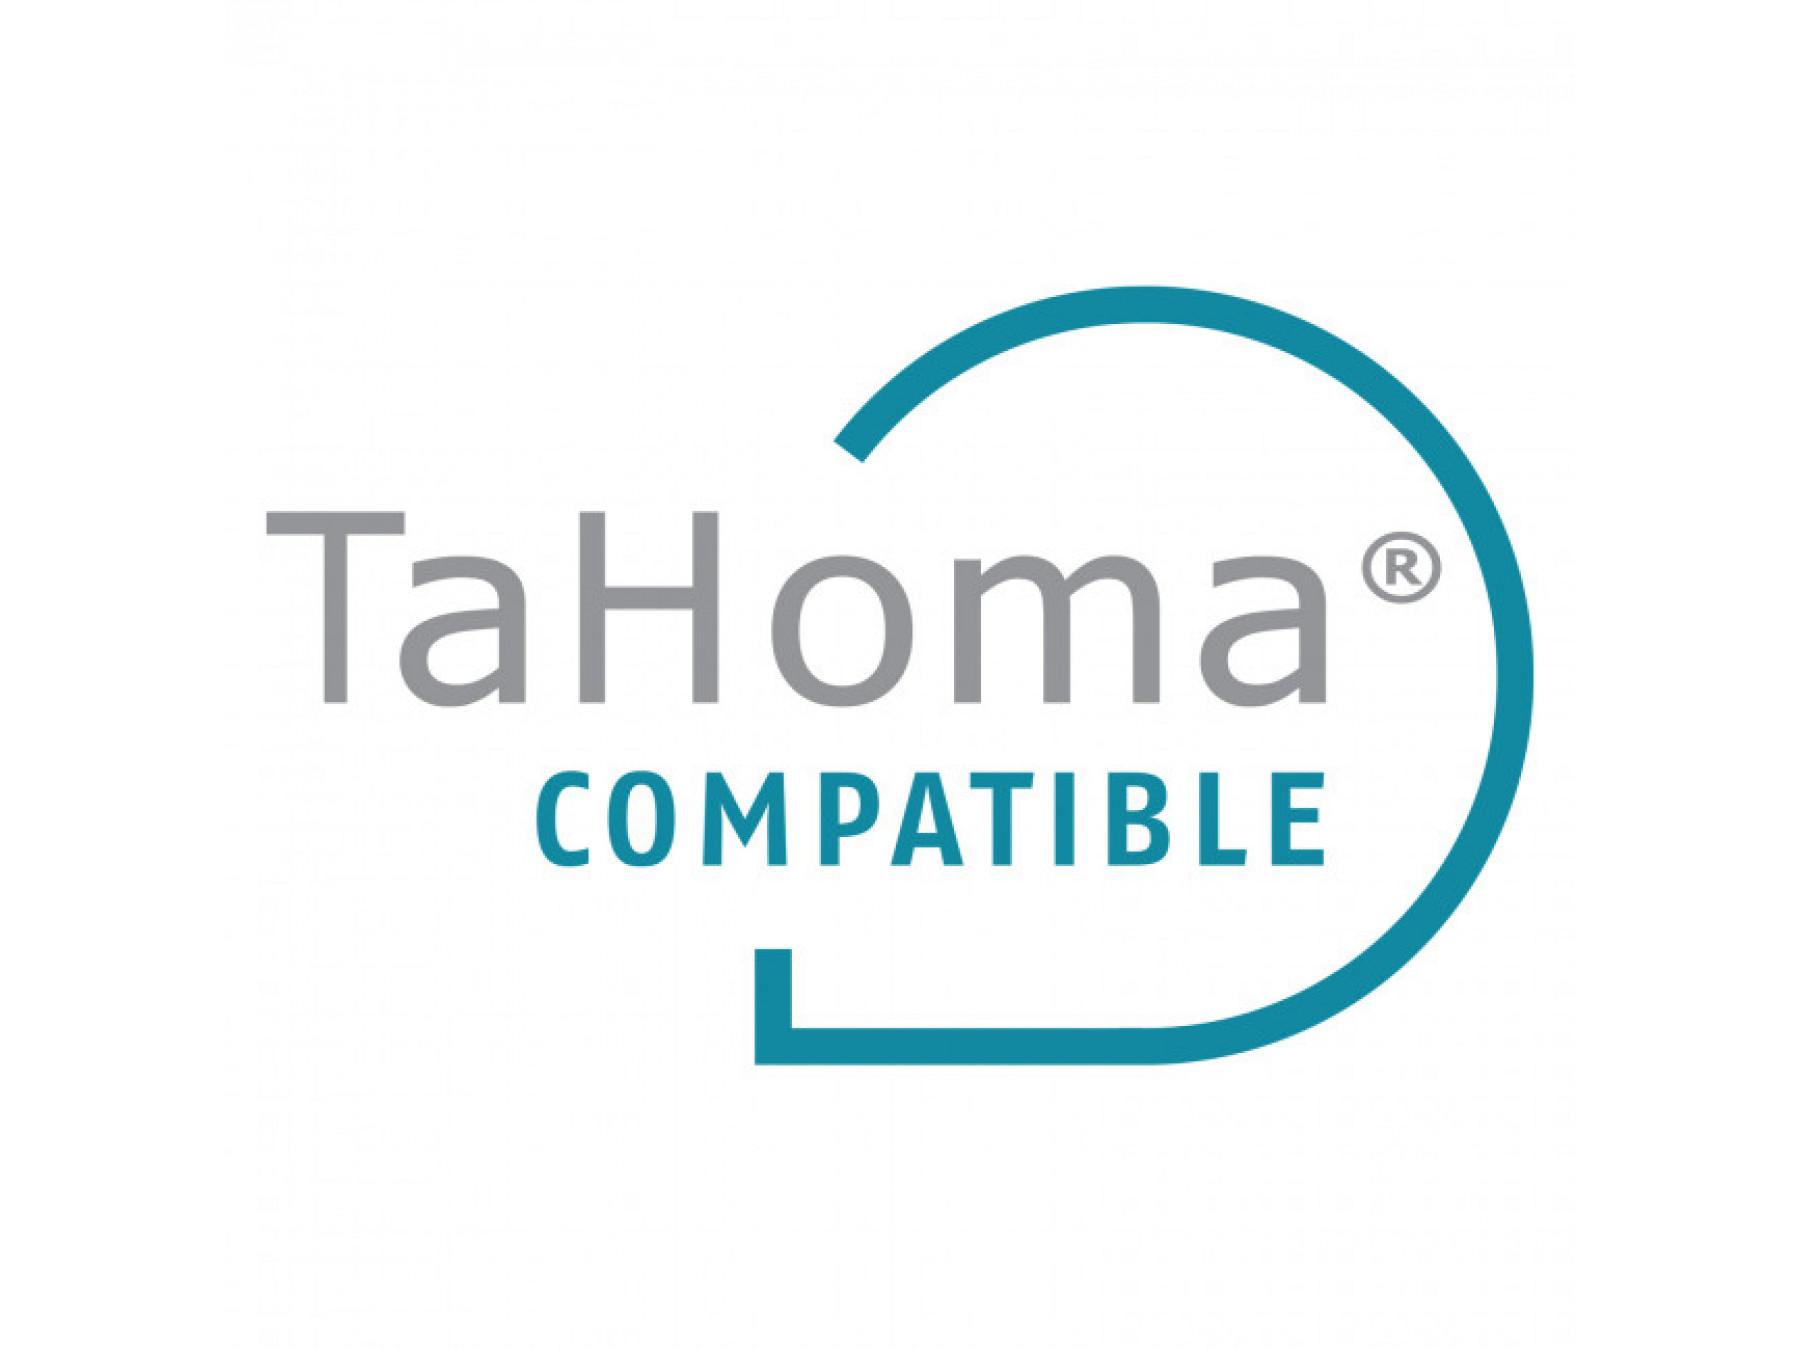 Tahoma grafika